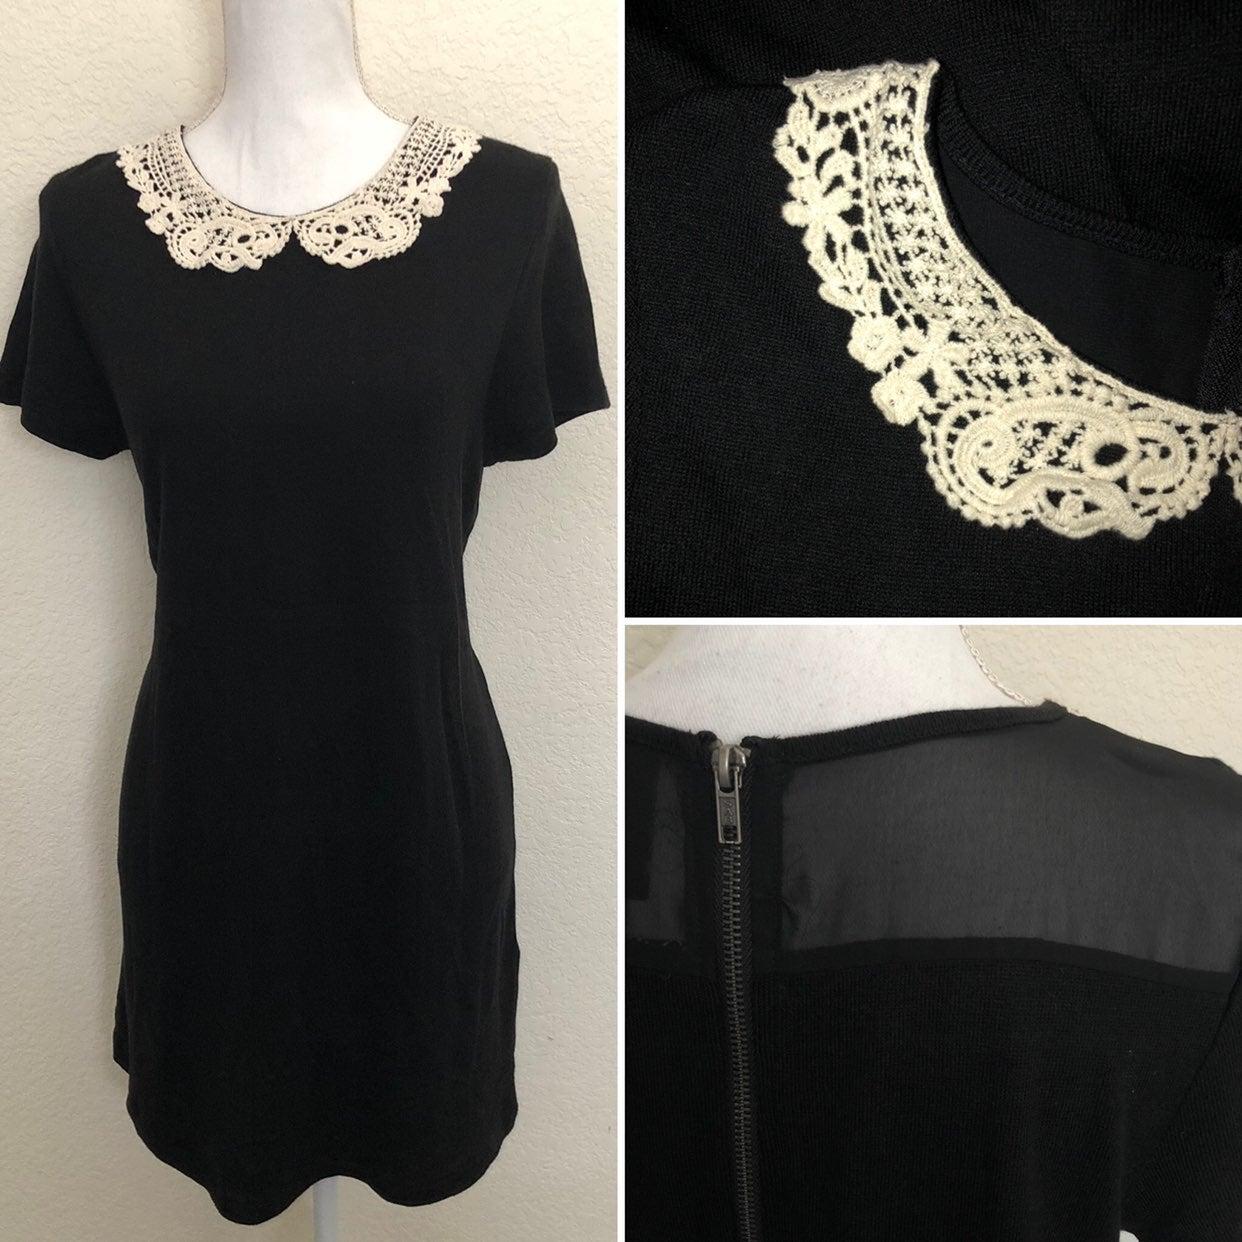 H&M Black Knit Crochet Collar Dress